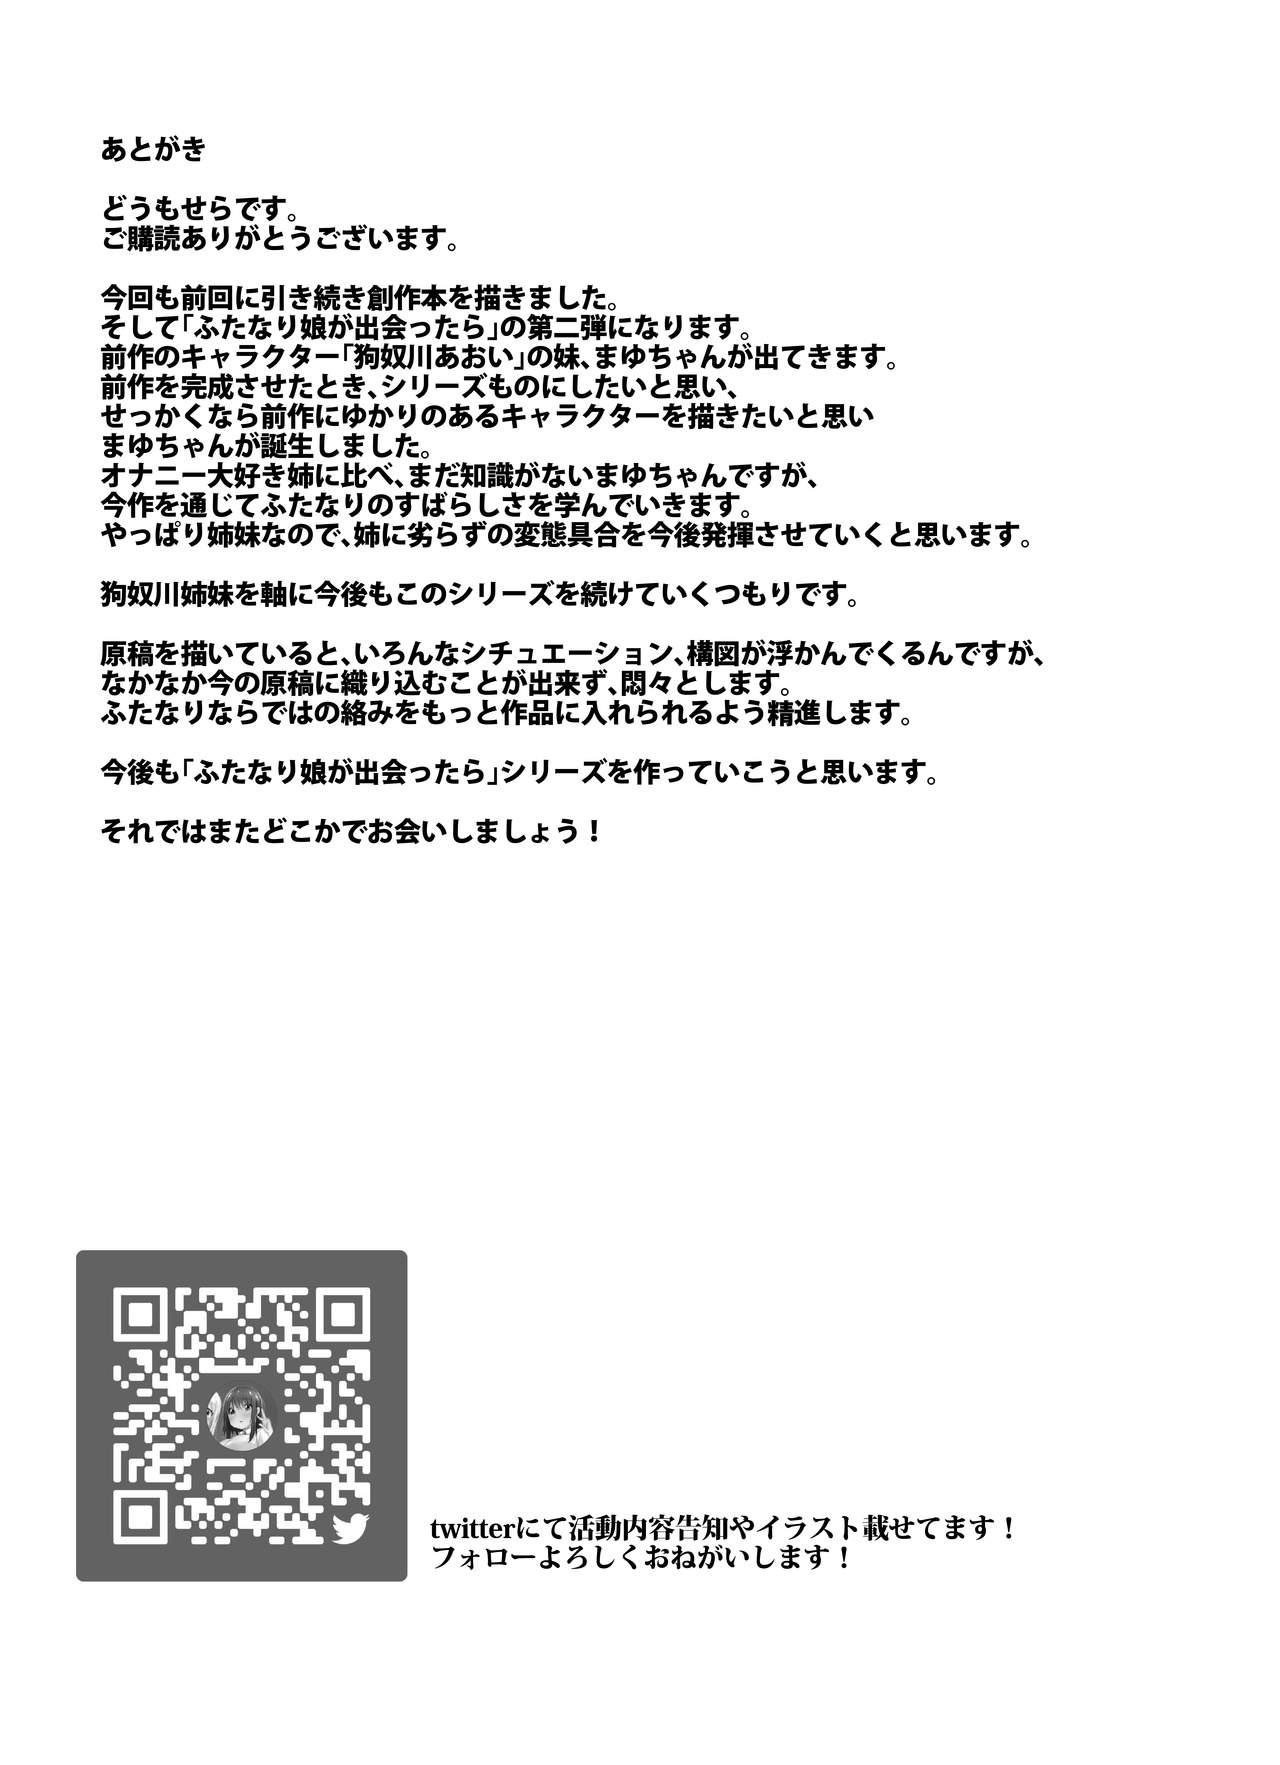 Futanari Musume ga Deattara 2 51